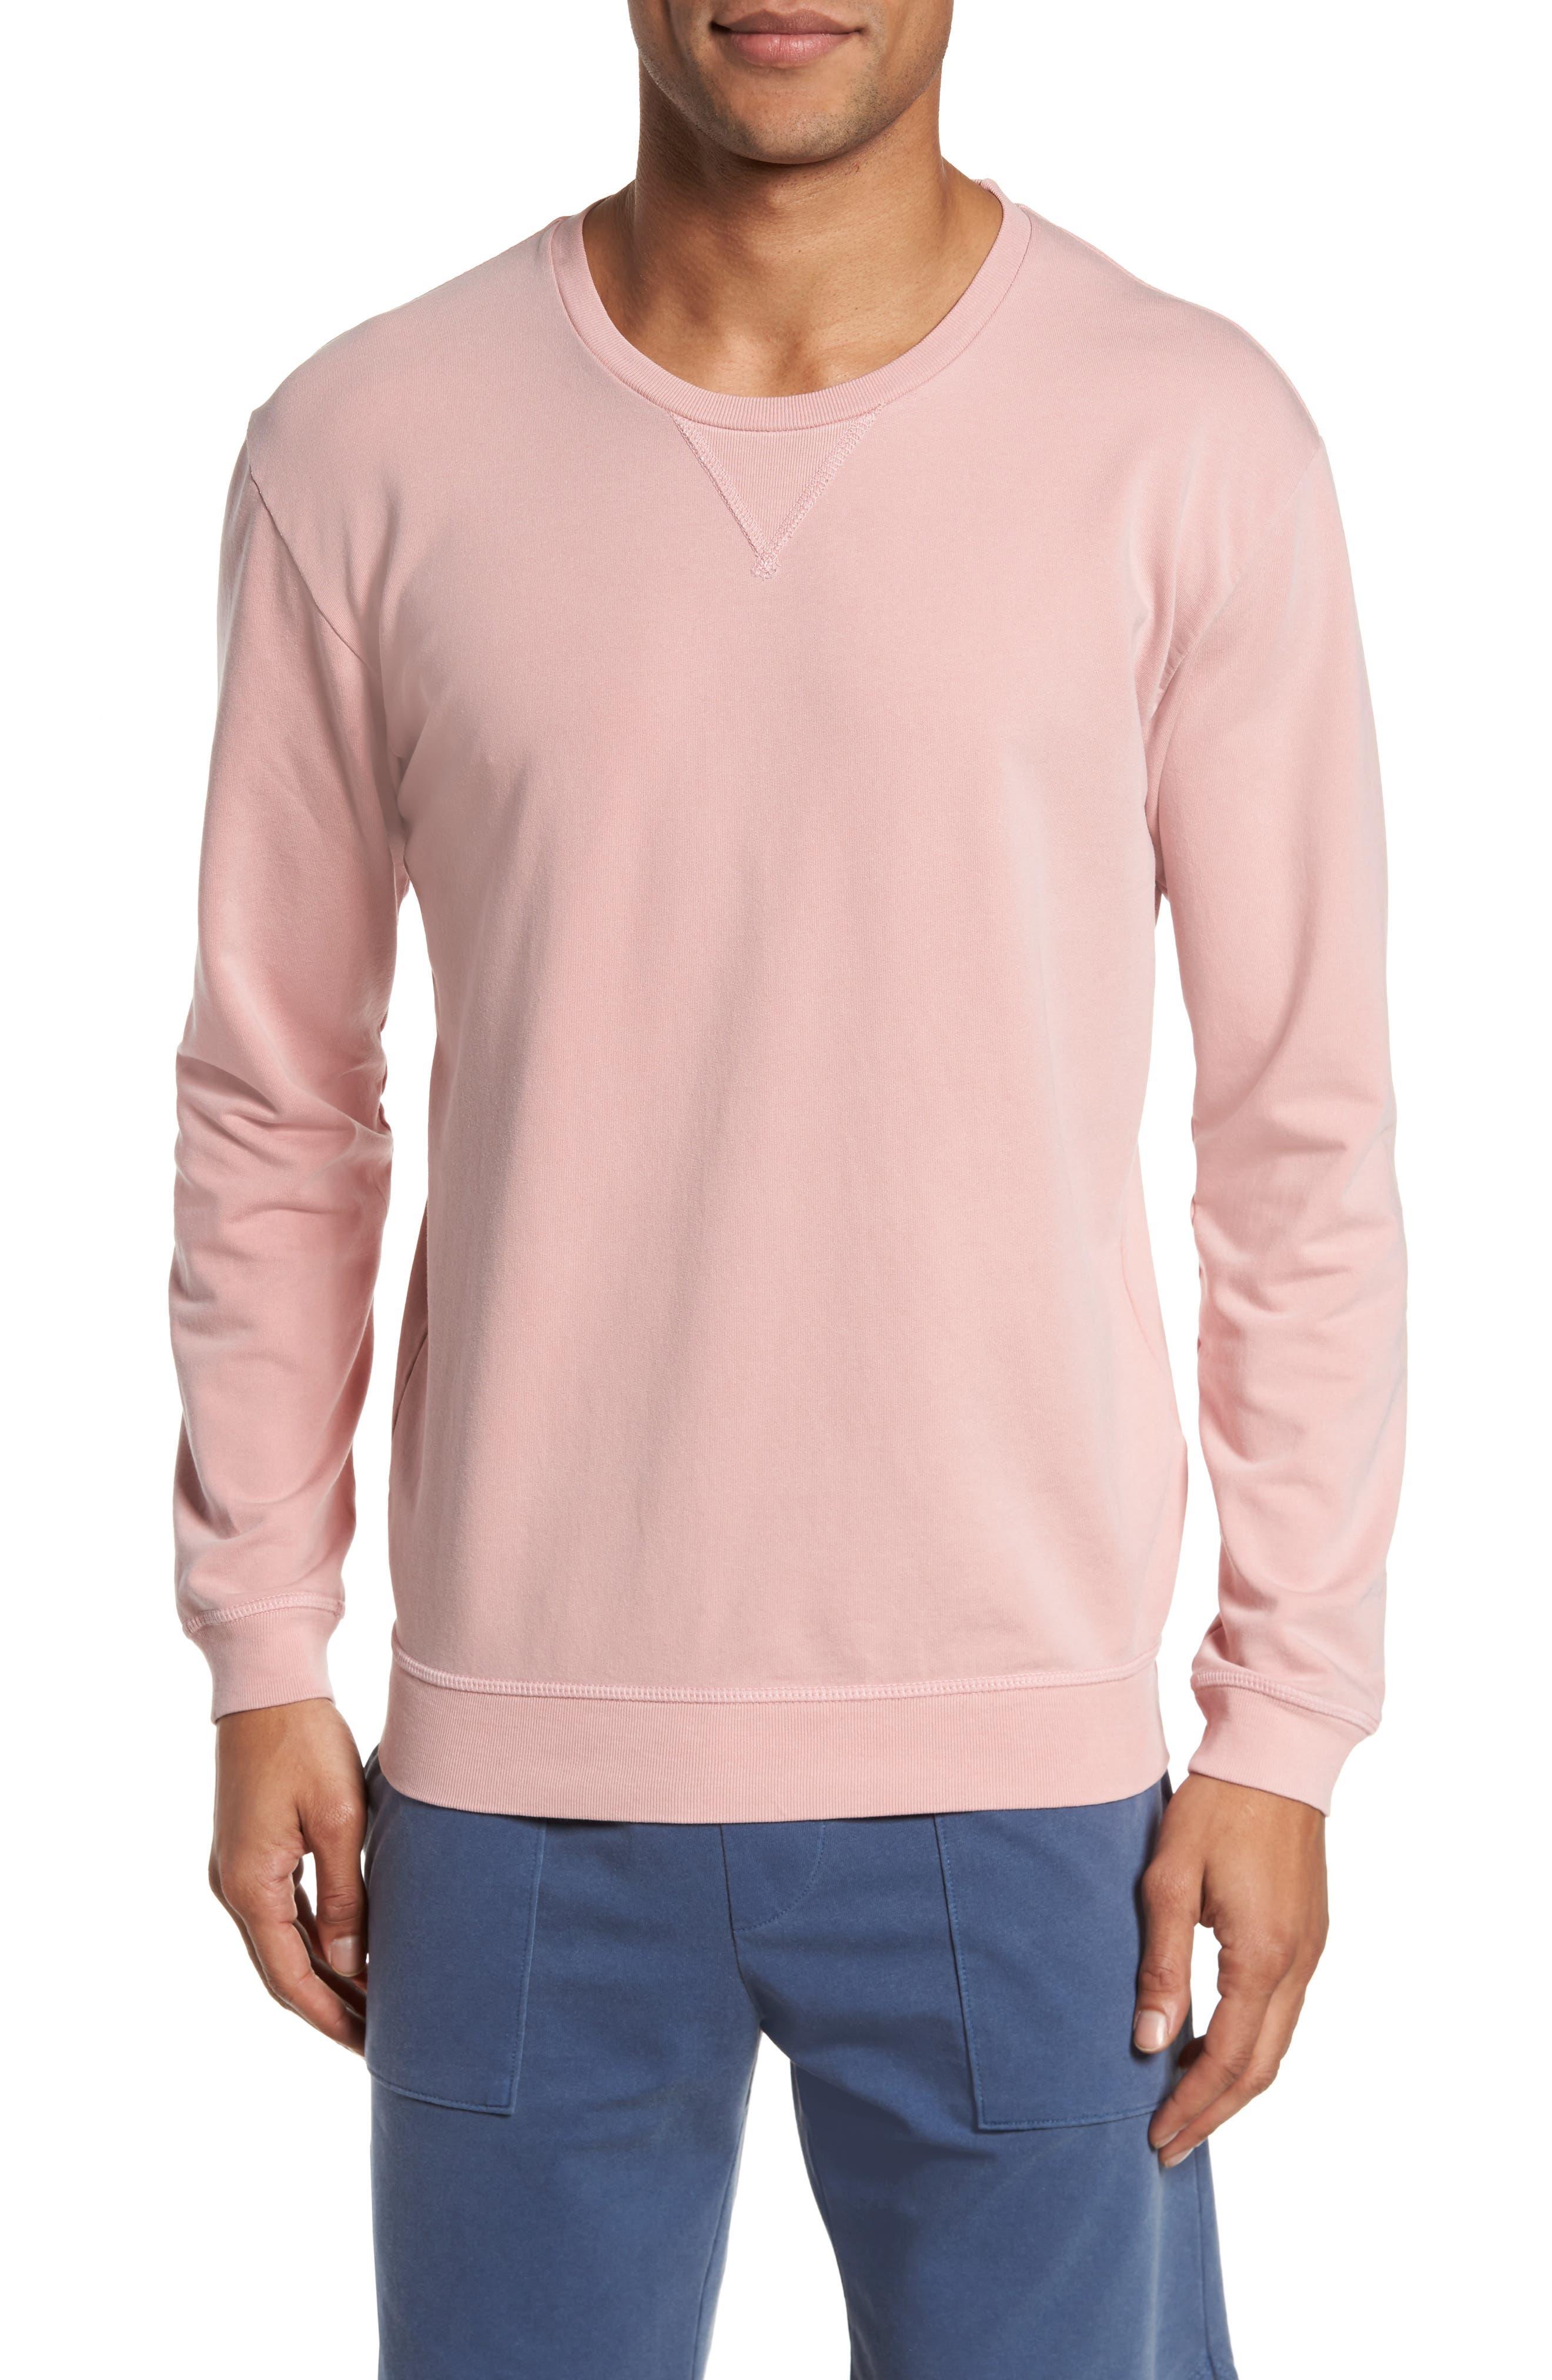 Alternate Image 1 Selected - Goodlife Slim Fit Crewneck Sweatshirt